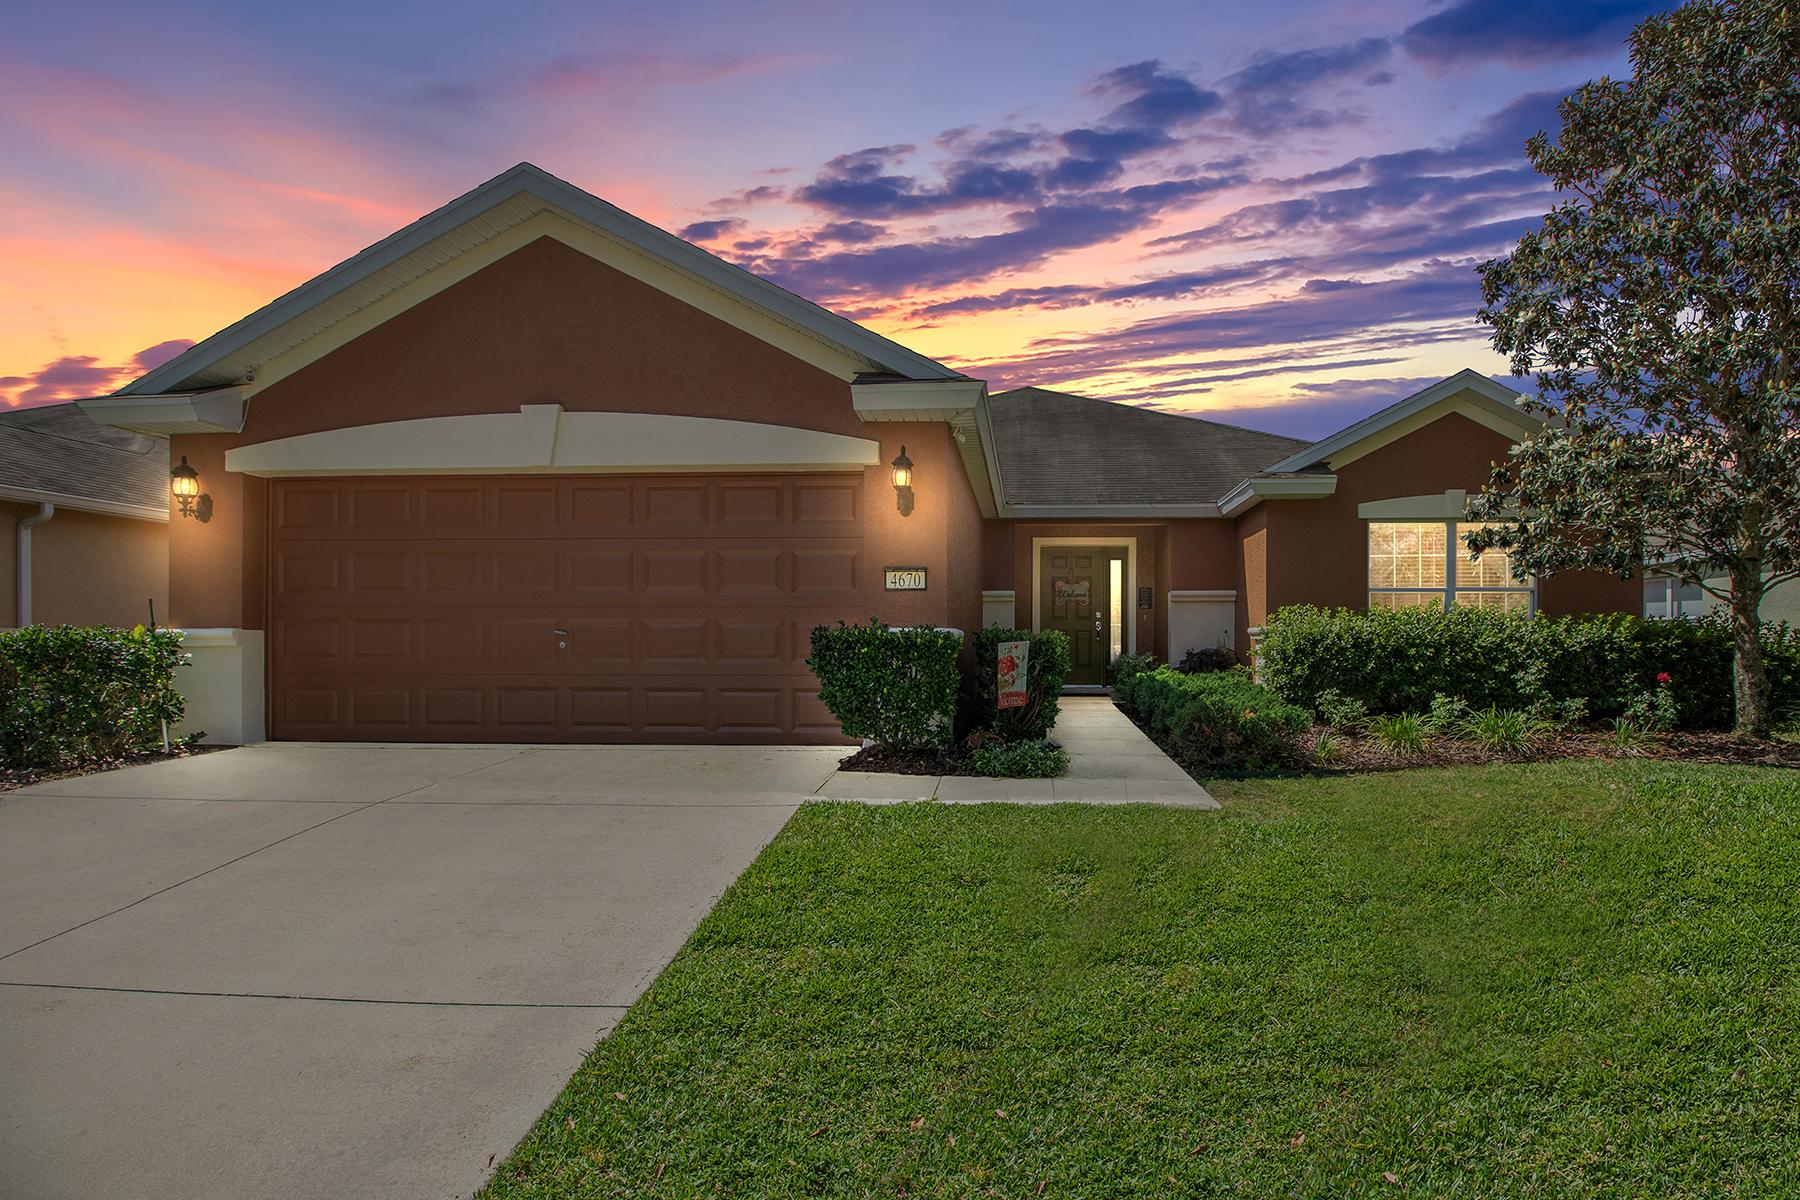 Single Family Homes for Active at OCALA 4670 SW 40TH LANE Ocala, Florida 34474 United States